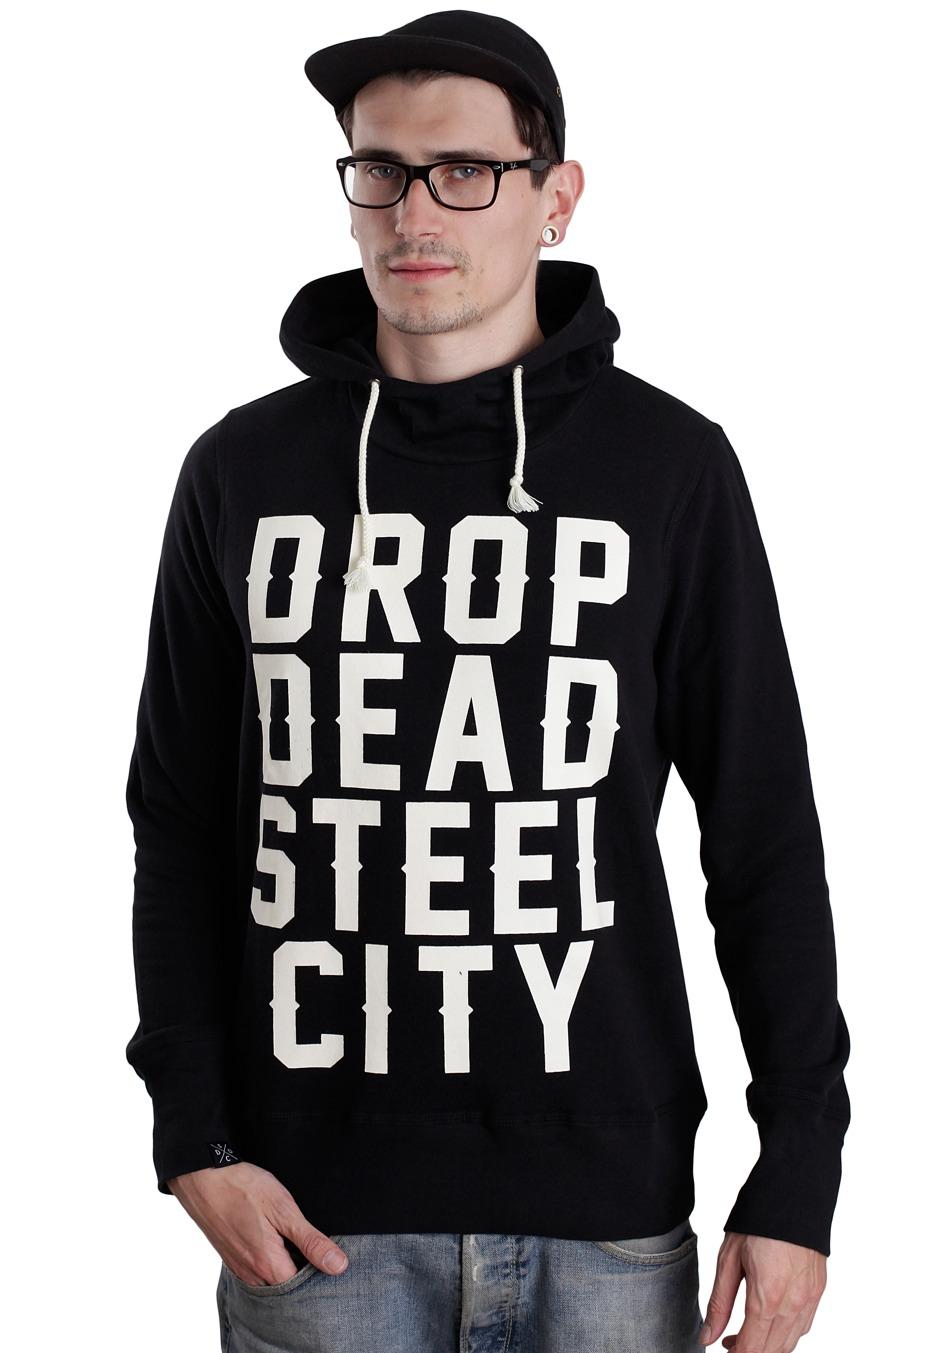 Drop Dead - City - Hoodie - Impericon.com Worldwide